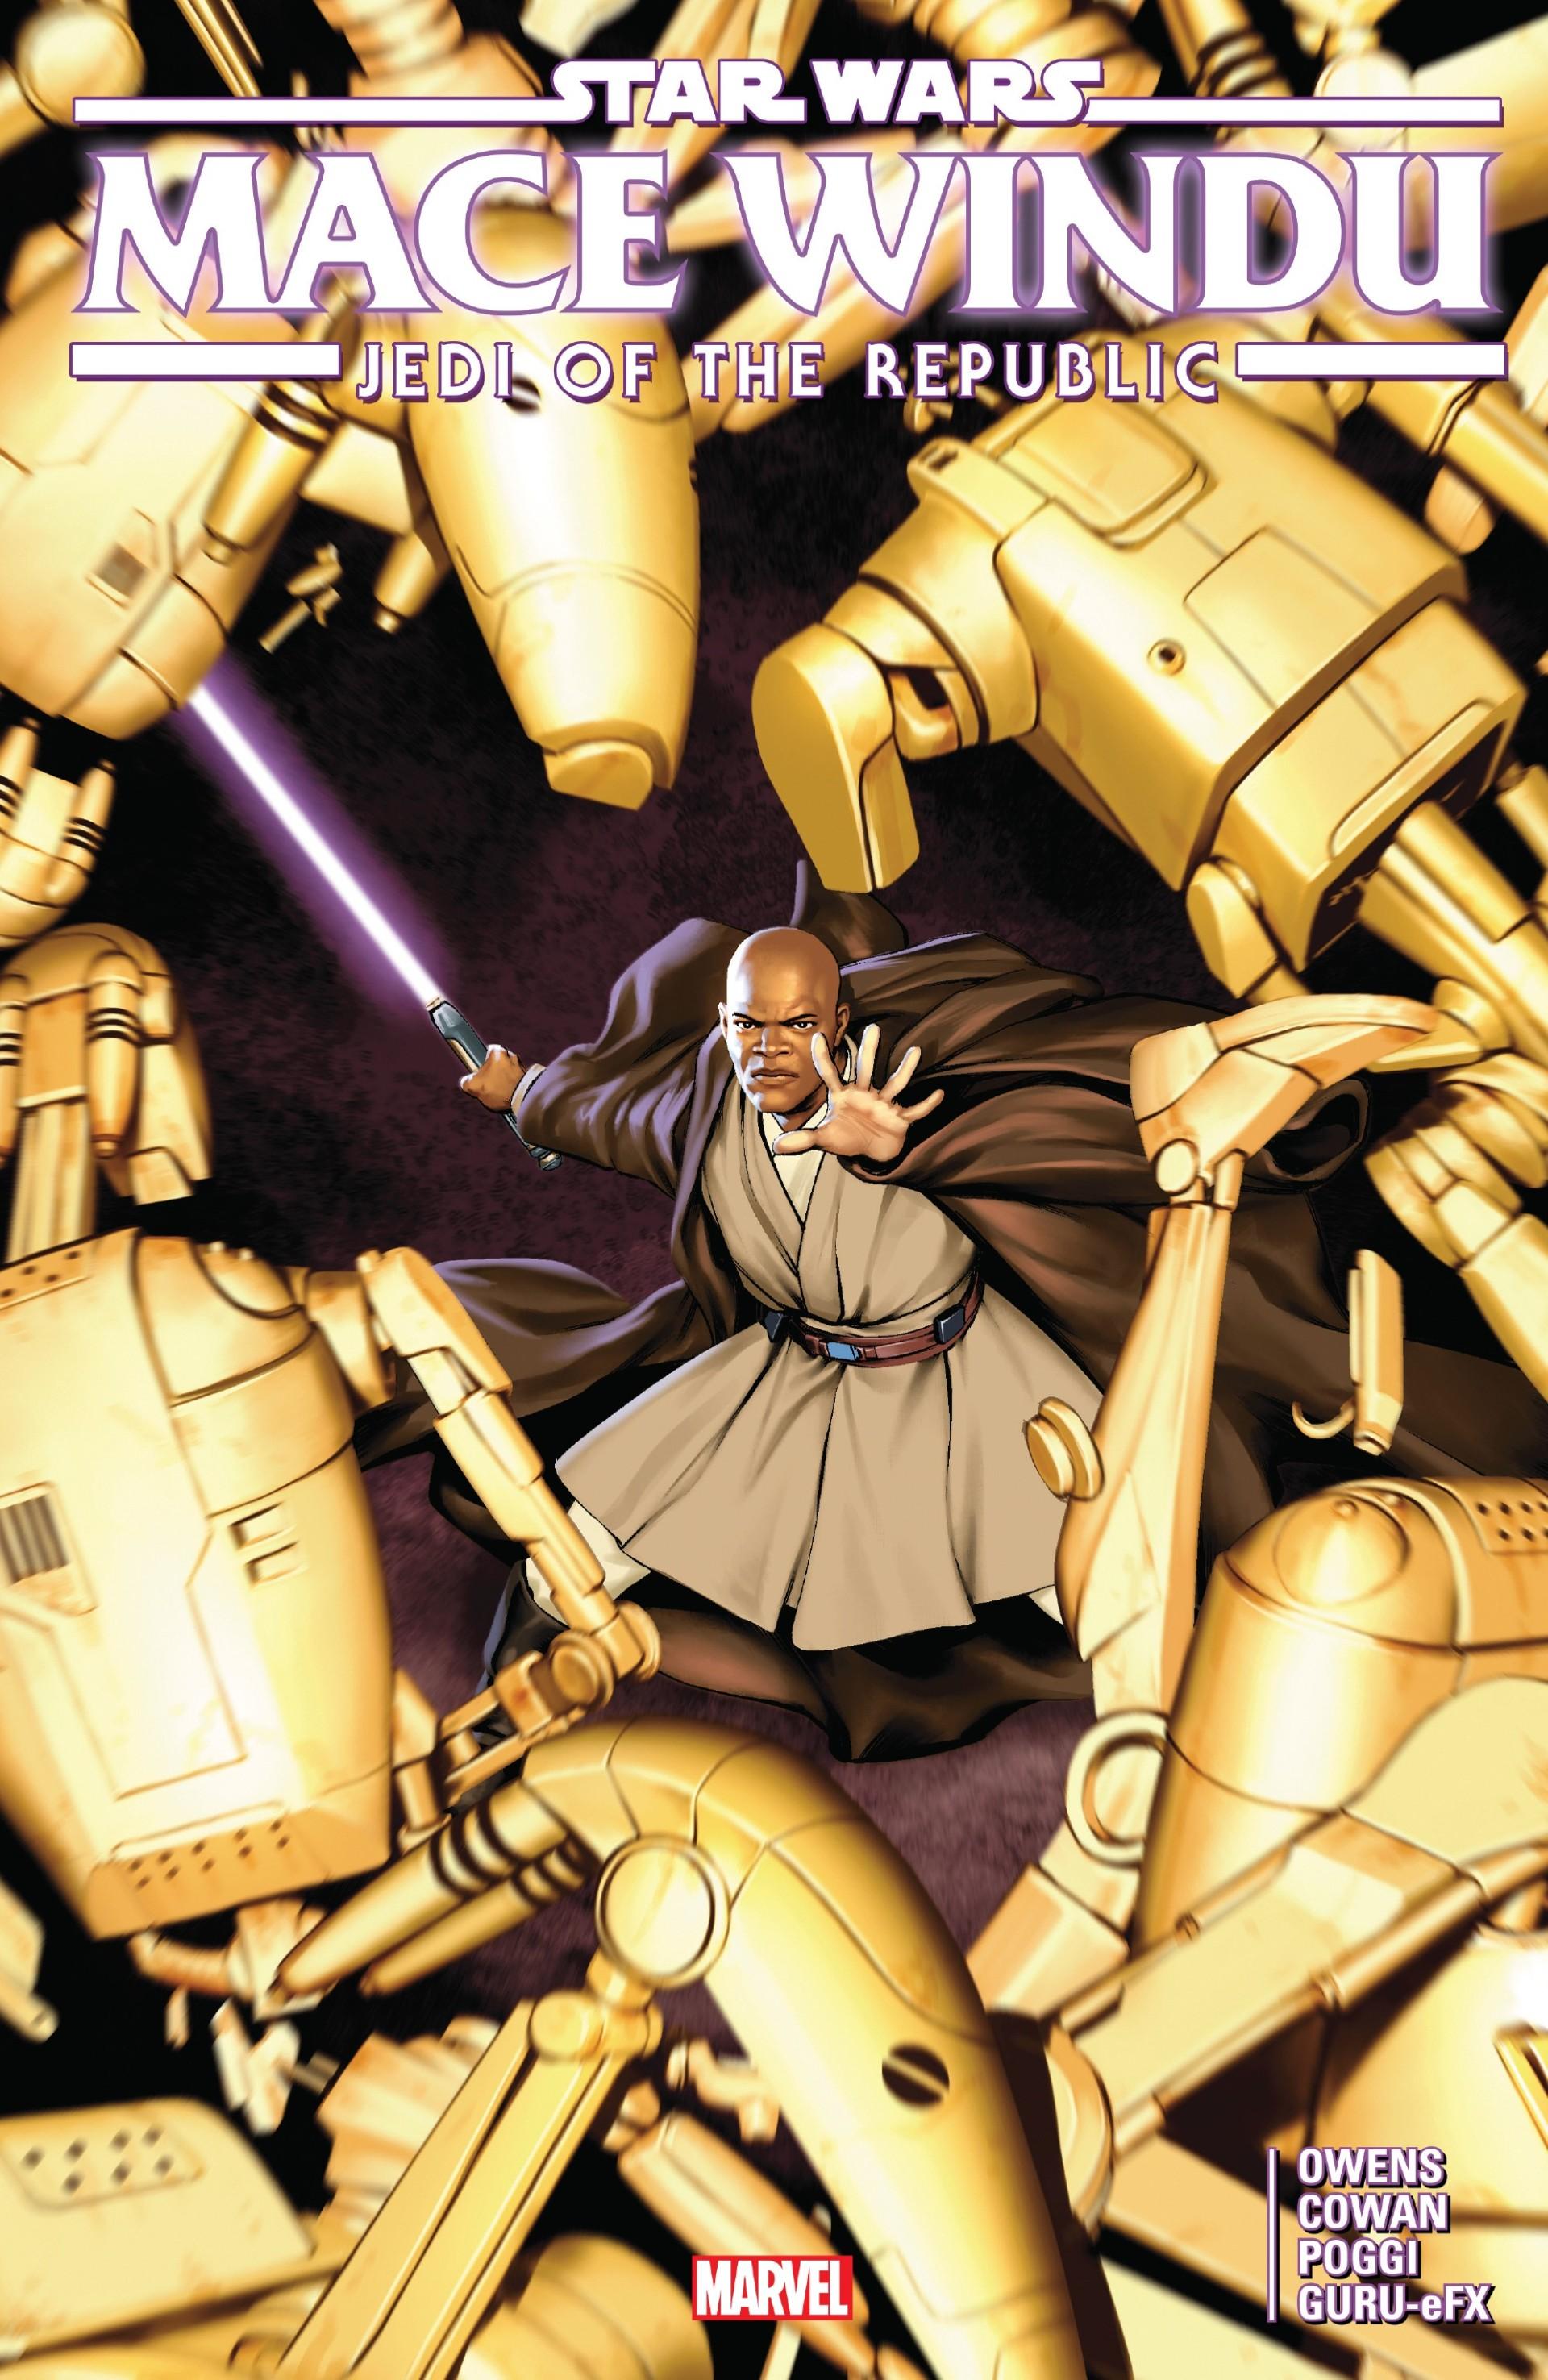 Comic Review | Star Wars: Jedi of the Republic – Mace Windu (A Second Opinion)